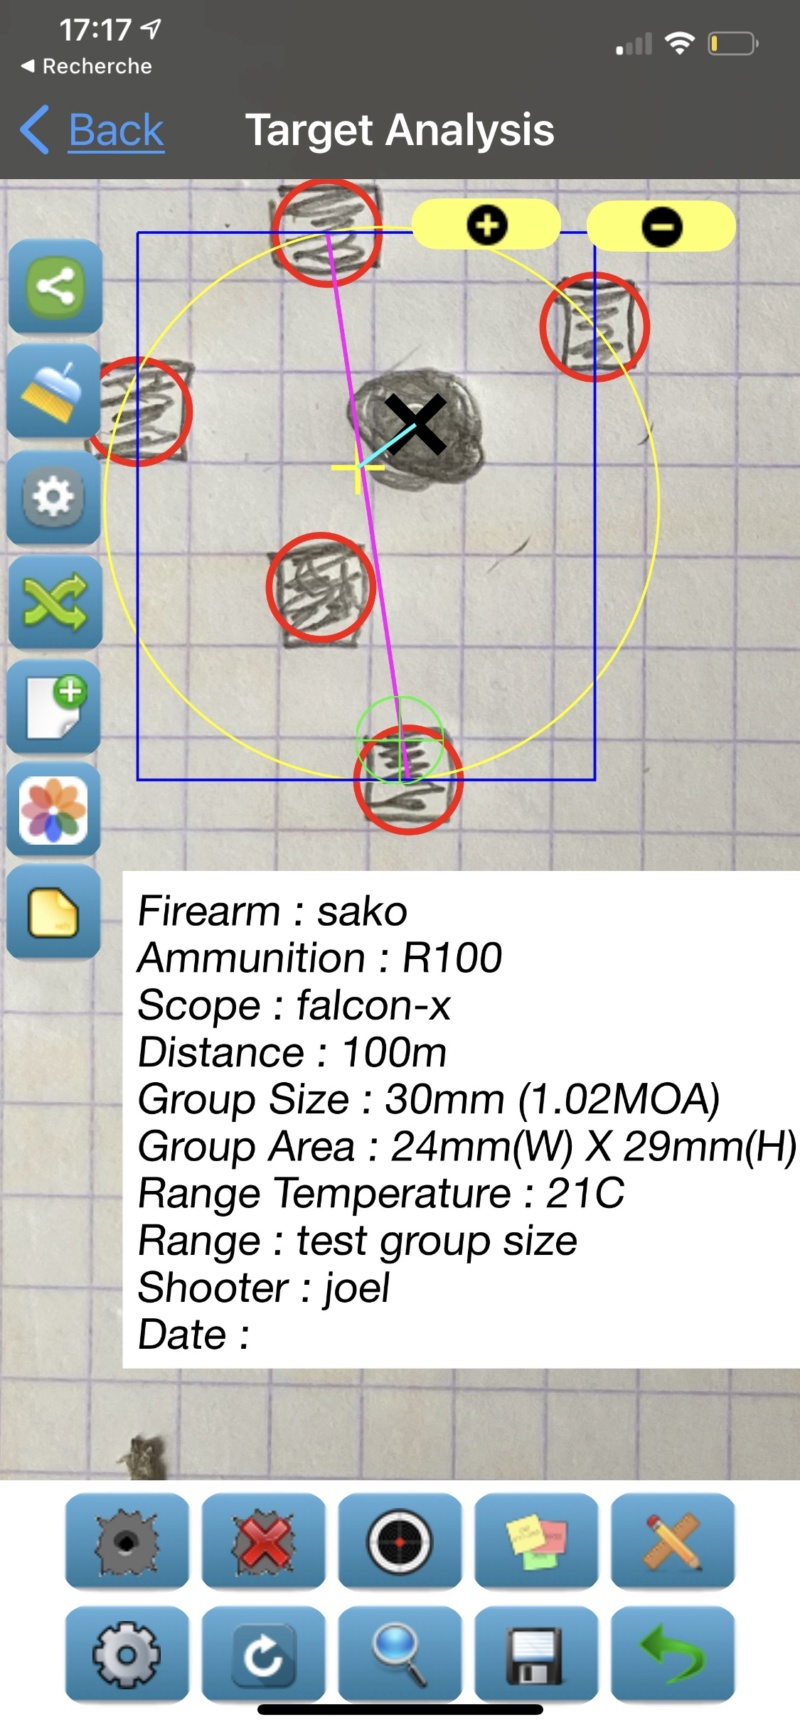 Groupe size mode de calcul Submoa, ballistic-x, targetScan  ?  D419b110